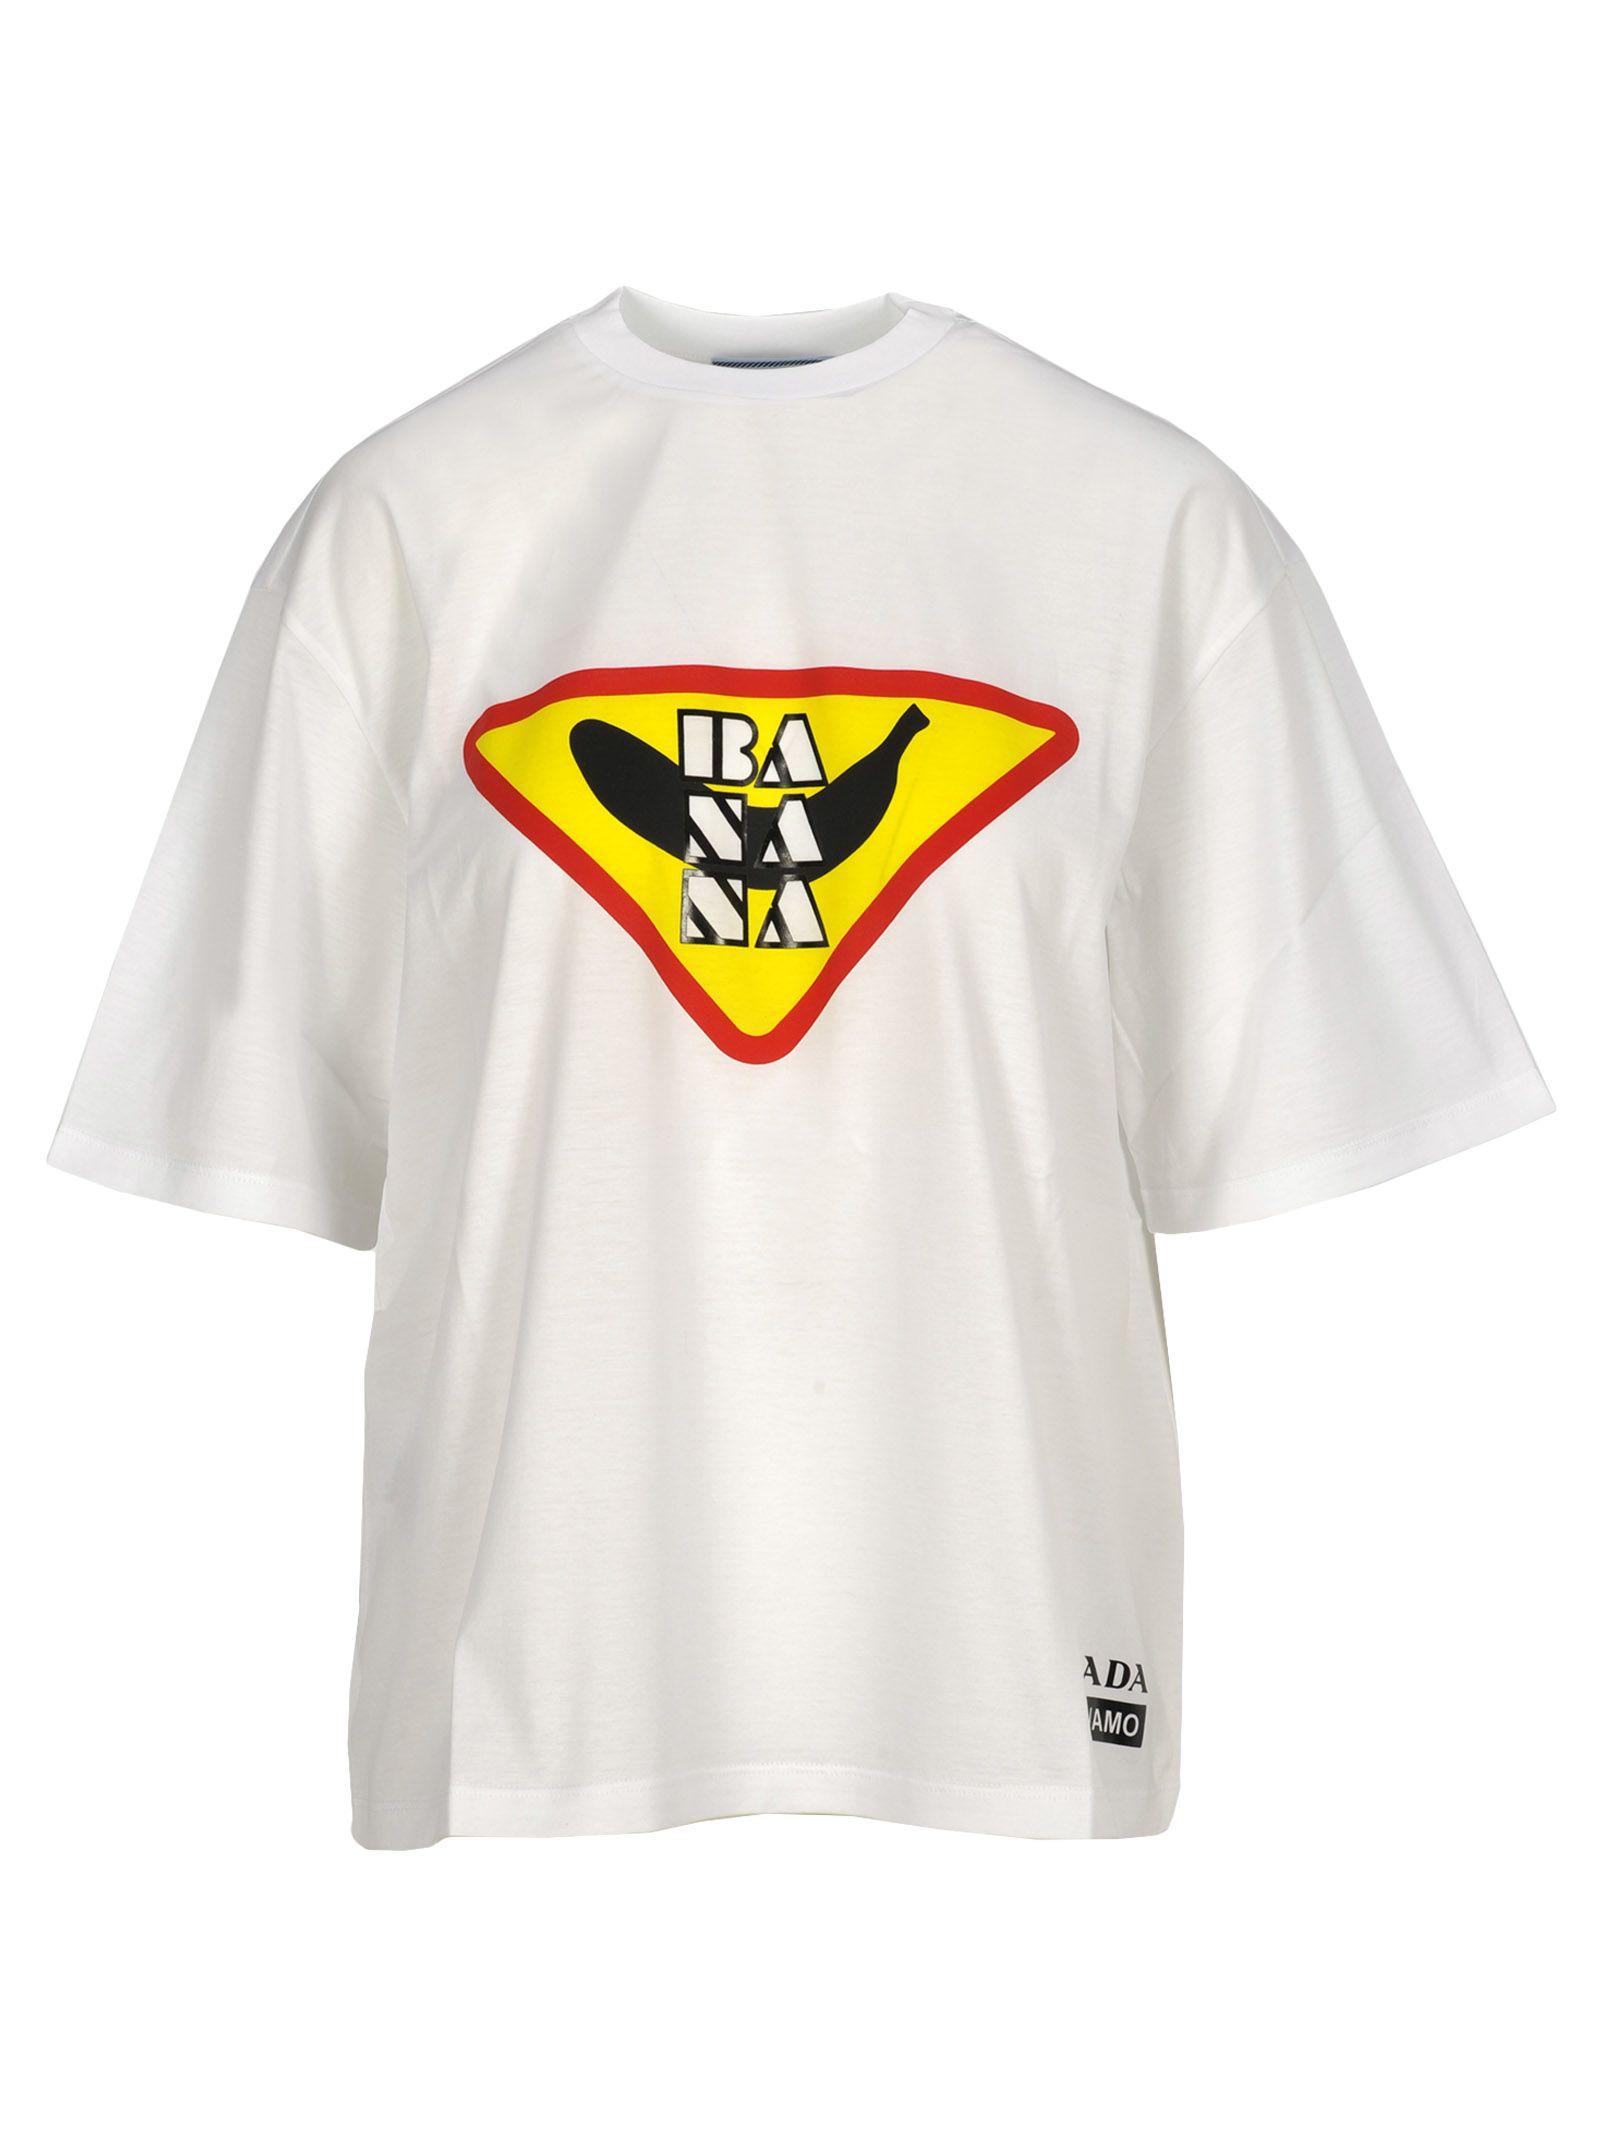 Prada Tshirt Banana